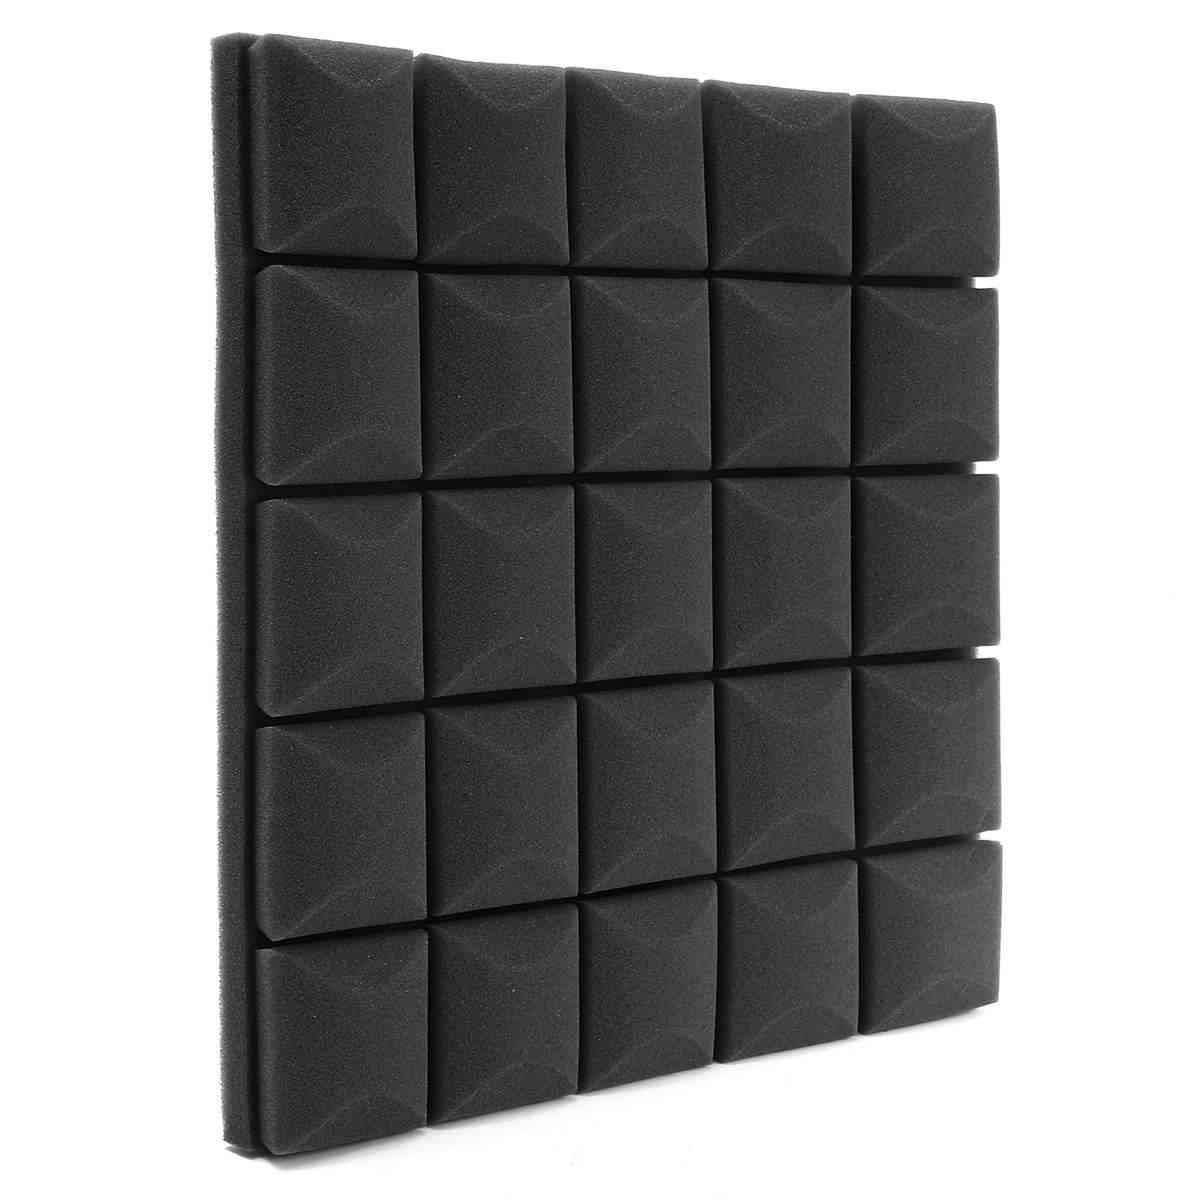 Studio Acoustic Panels, Soundproofing Foam, Absorption Sponge For Ktv Drum Room